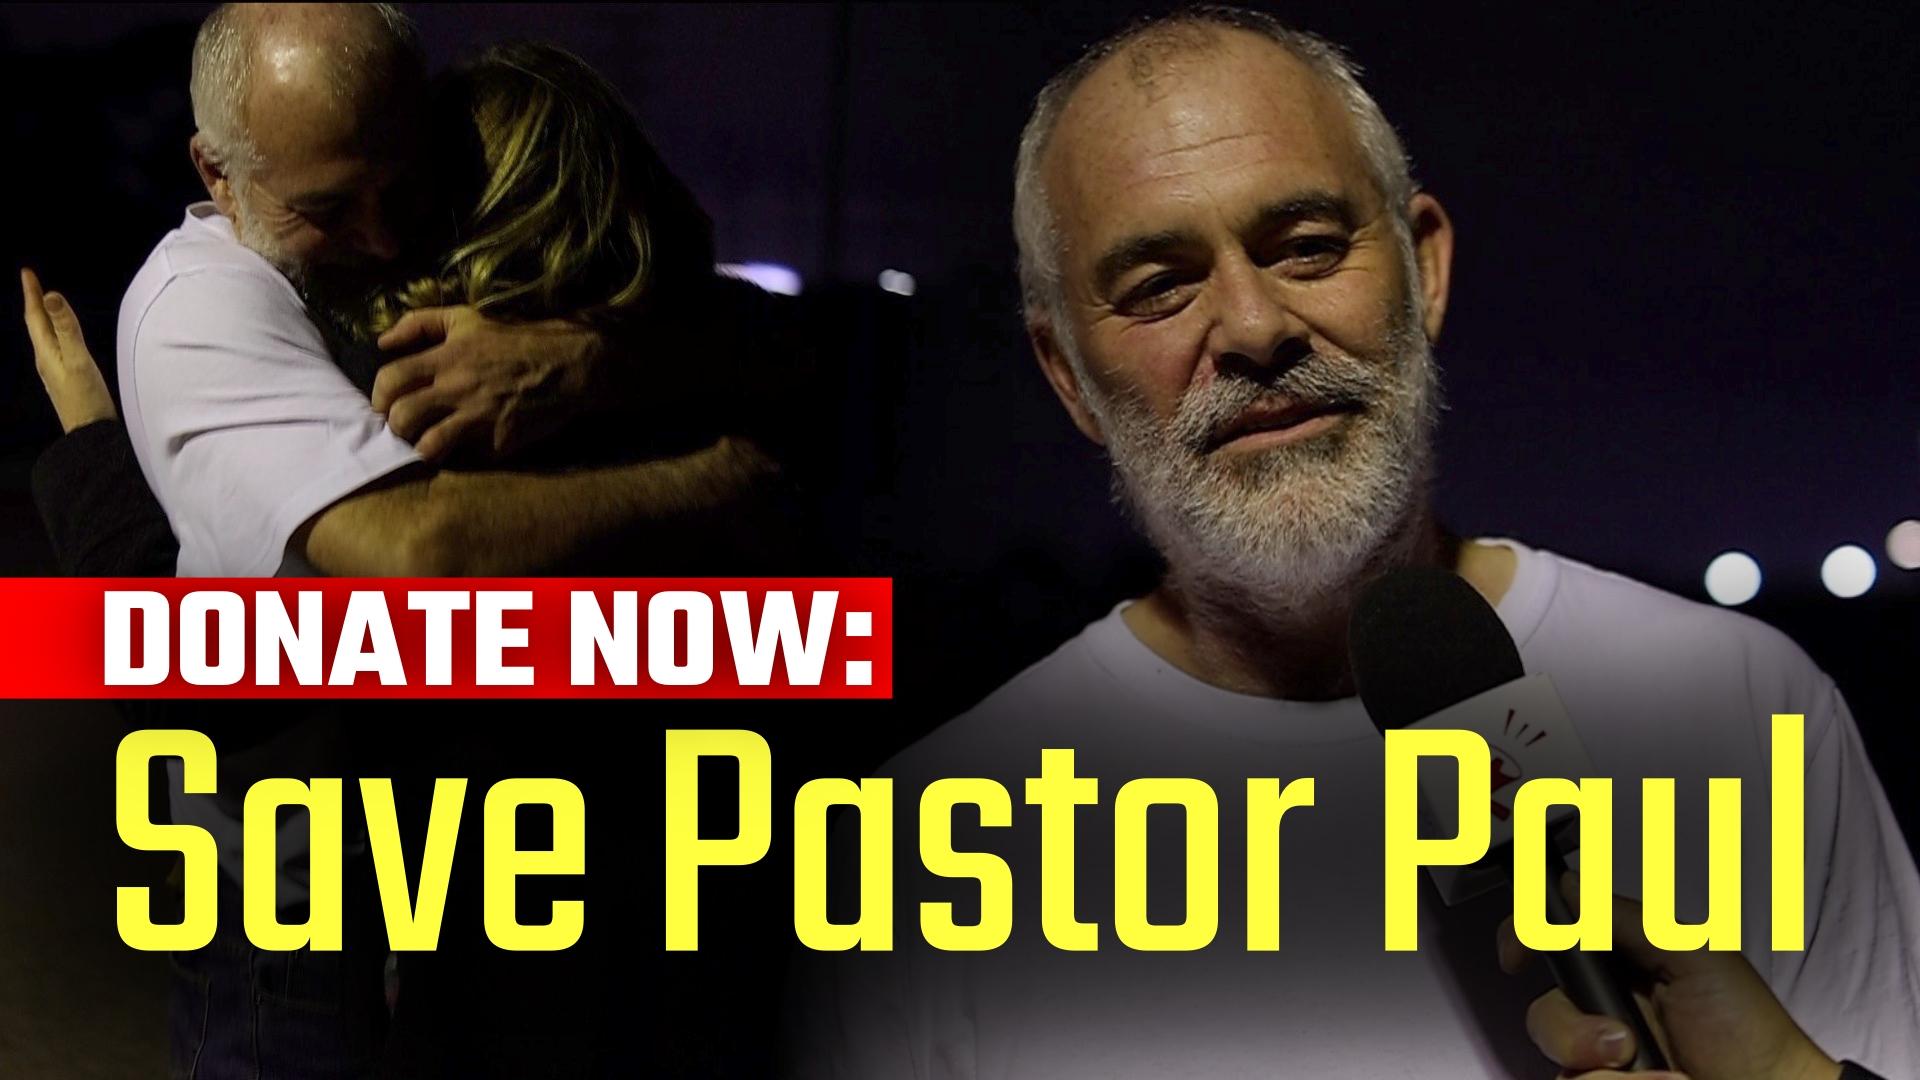 Save Pastor Paul Donation